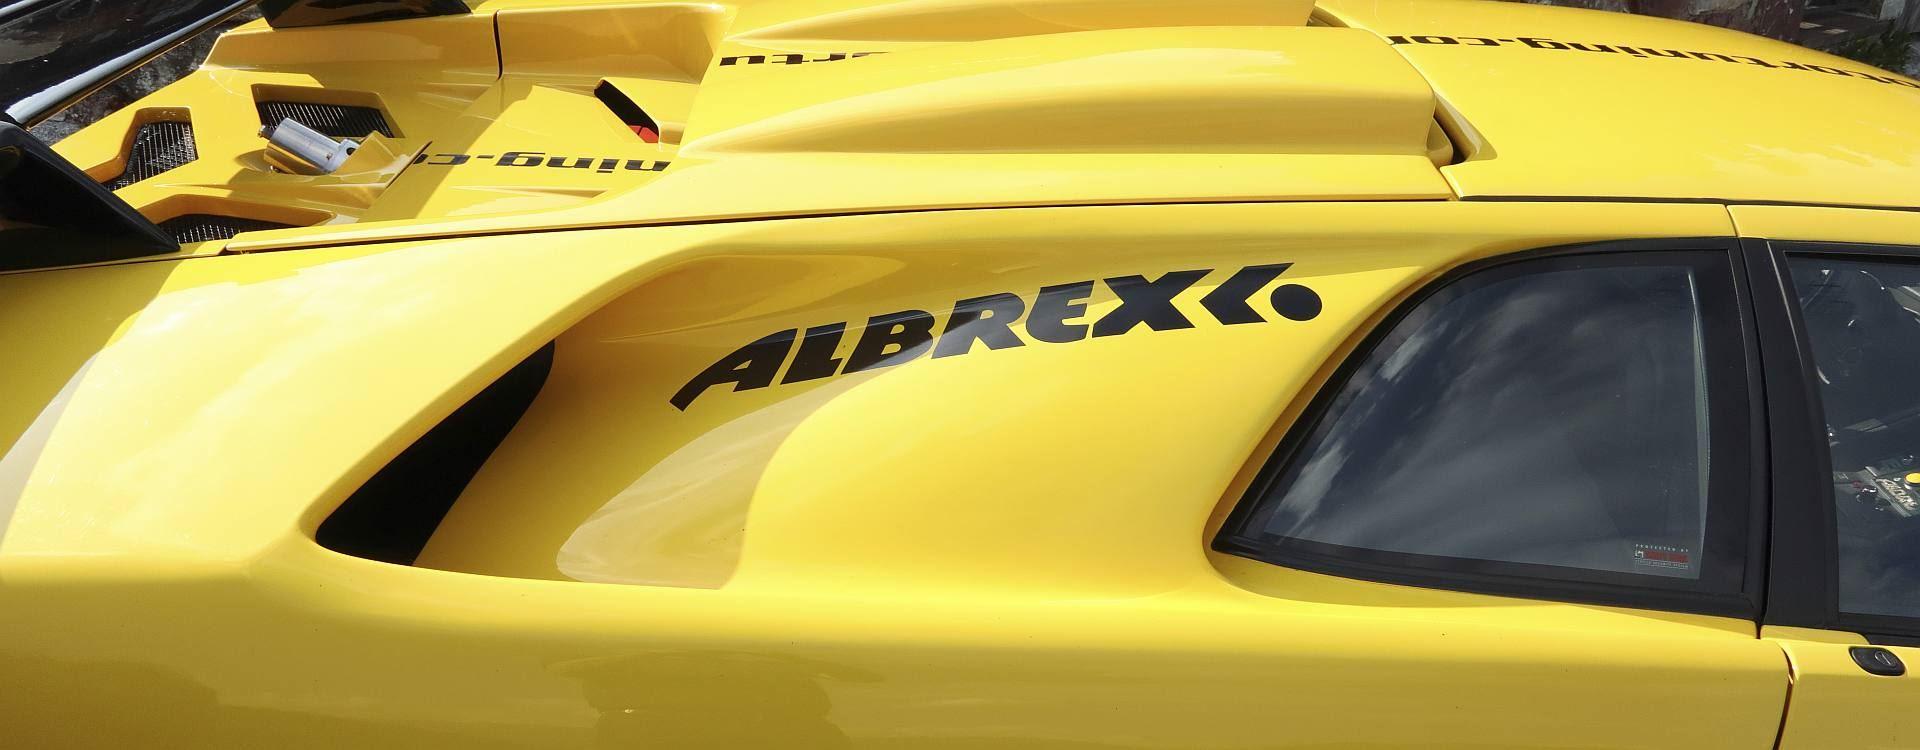 Albrex